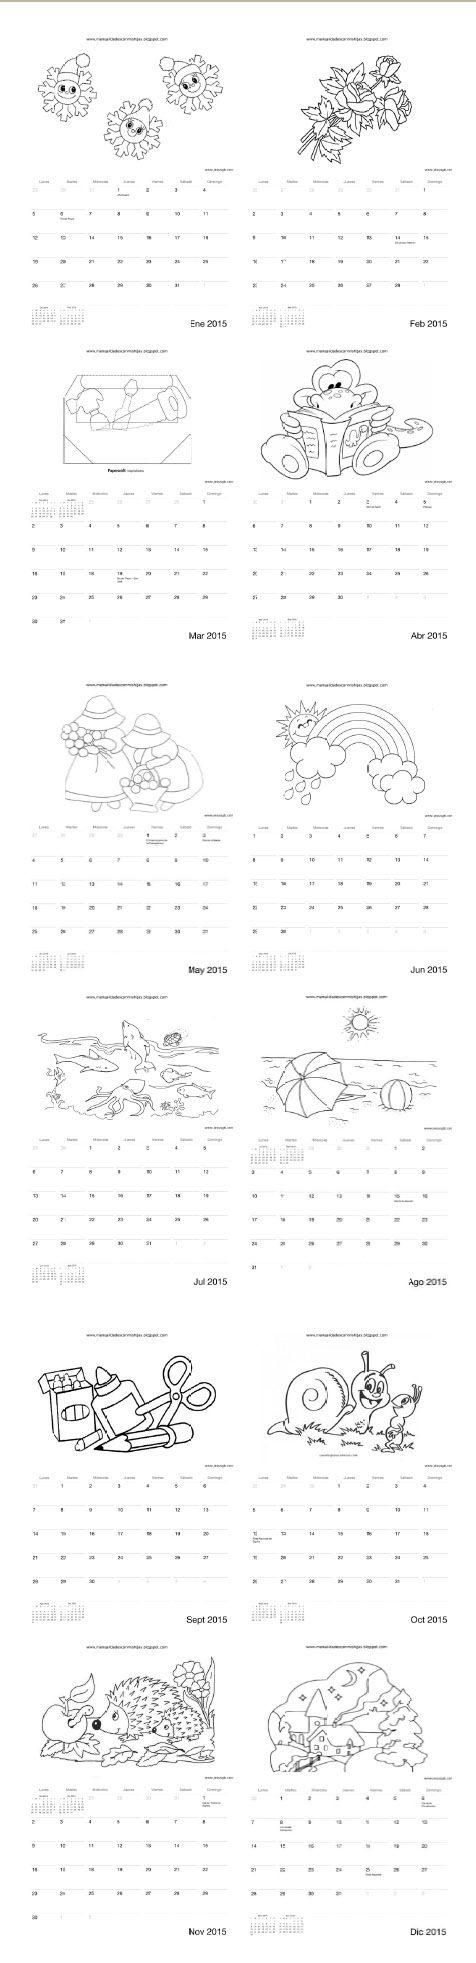 Calendario 2015 para colorear niños - Manualidadesconmishijas